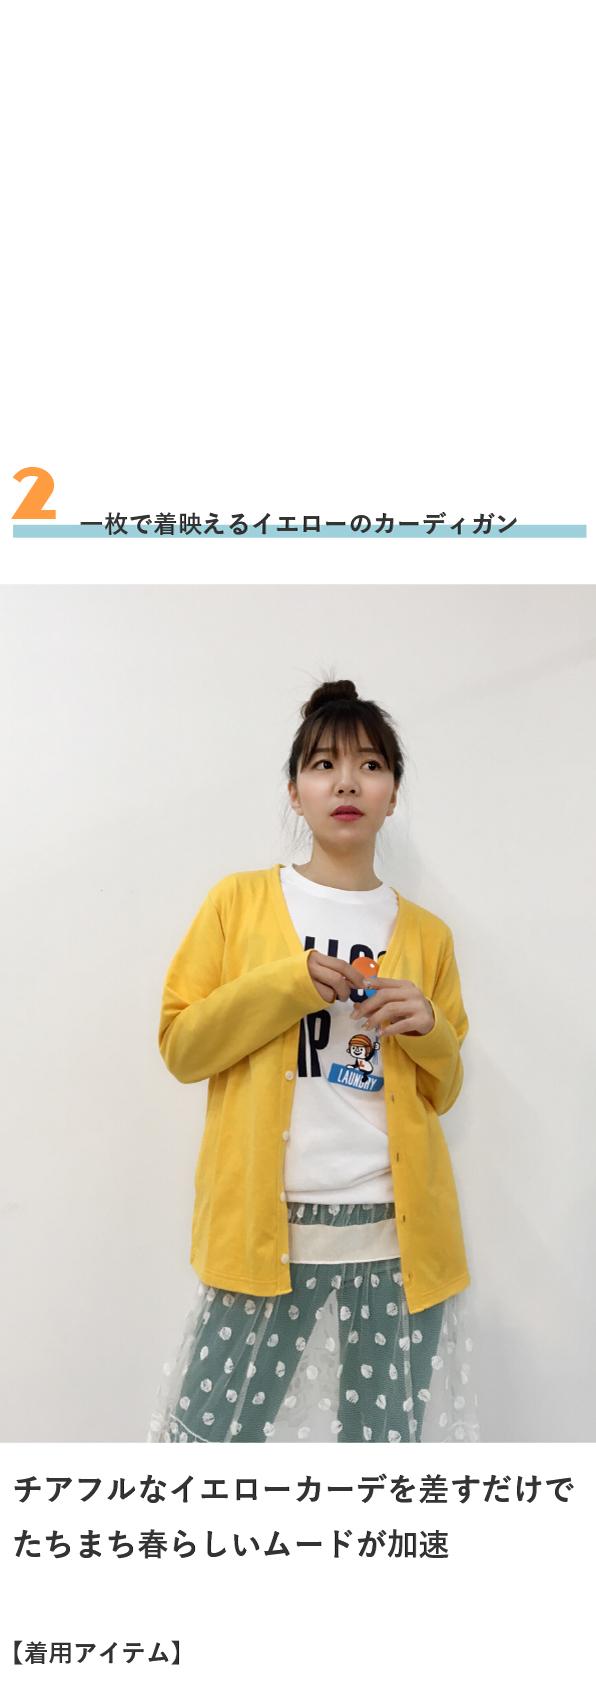 0303haori-05-596